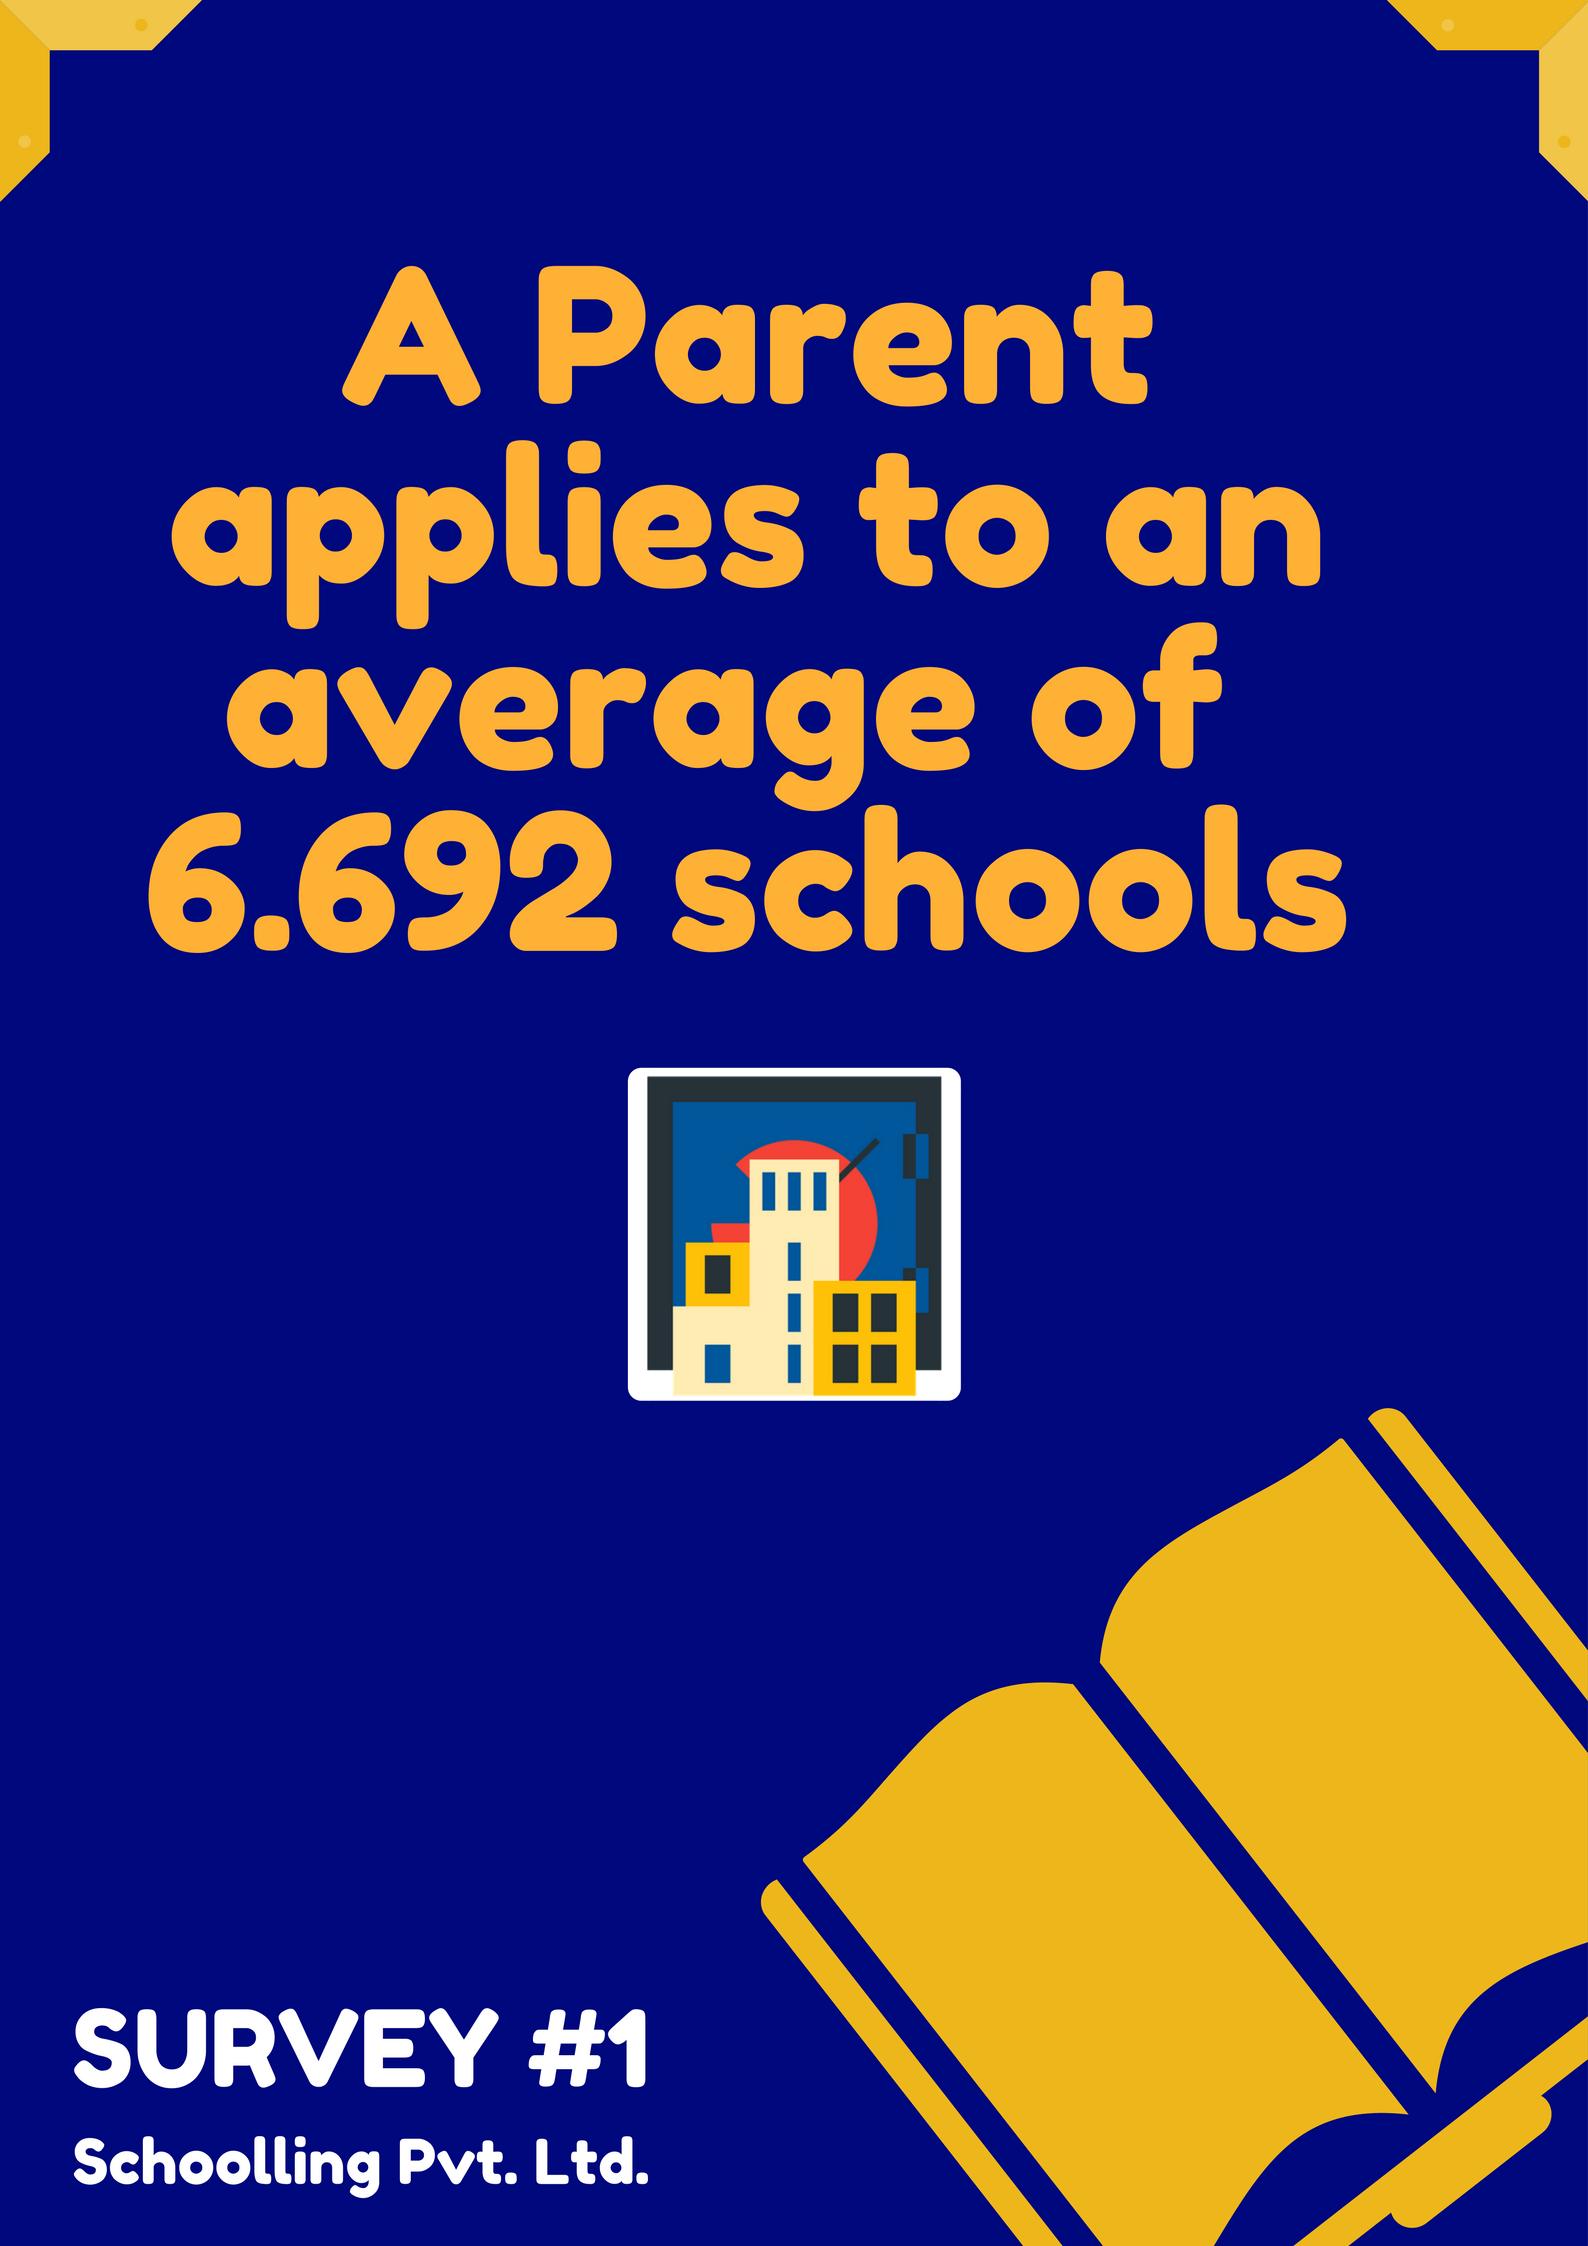 www.schoolling.com-Parent-Survey-School-Apply